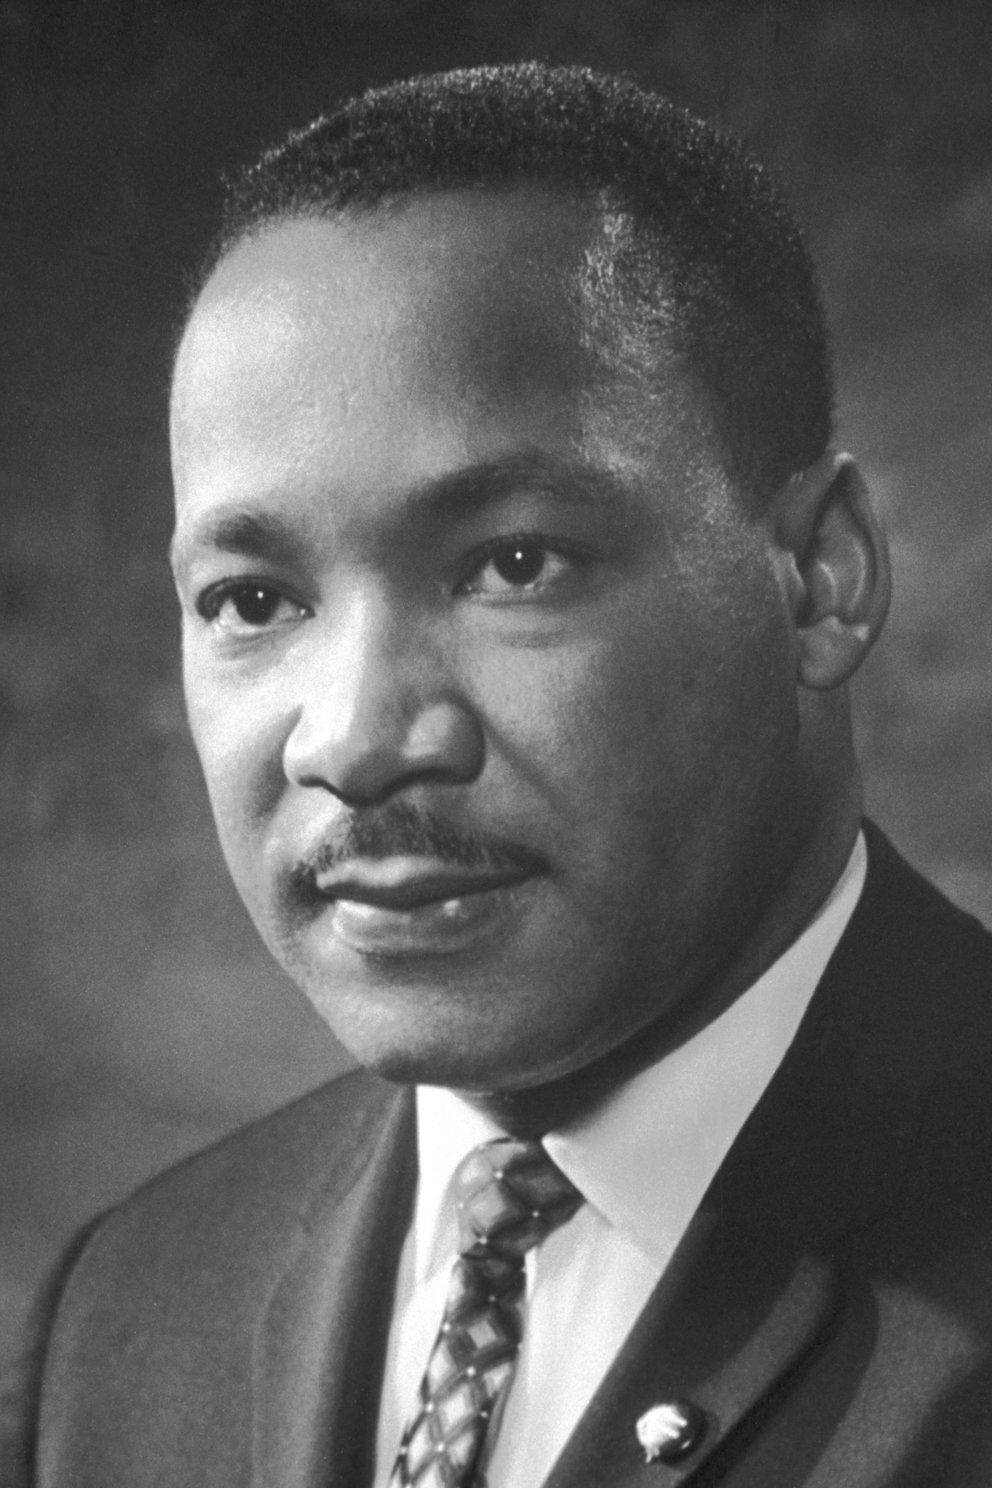 Martin_Luther_King,_Jr.jpg